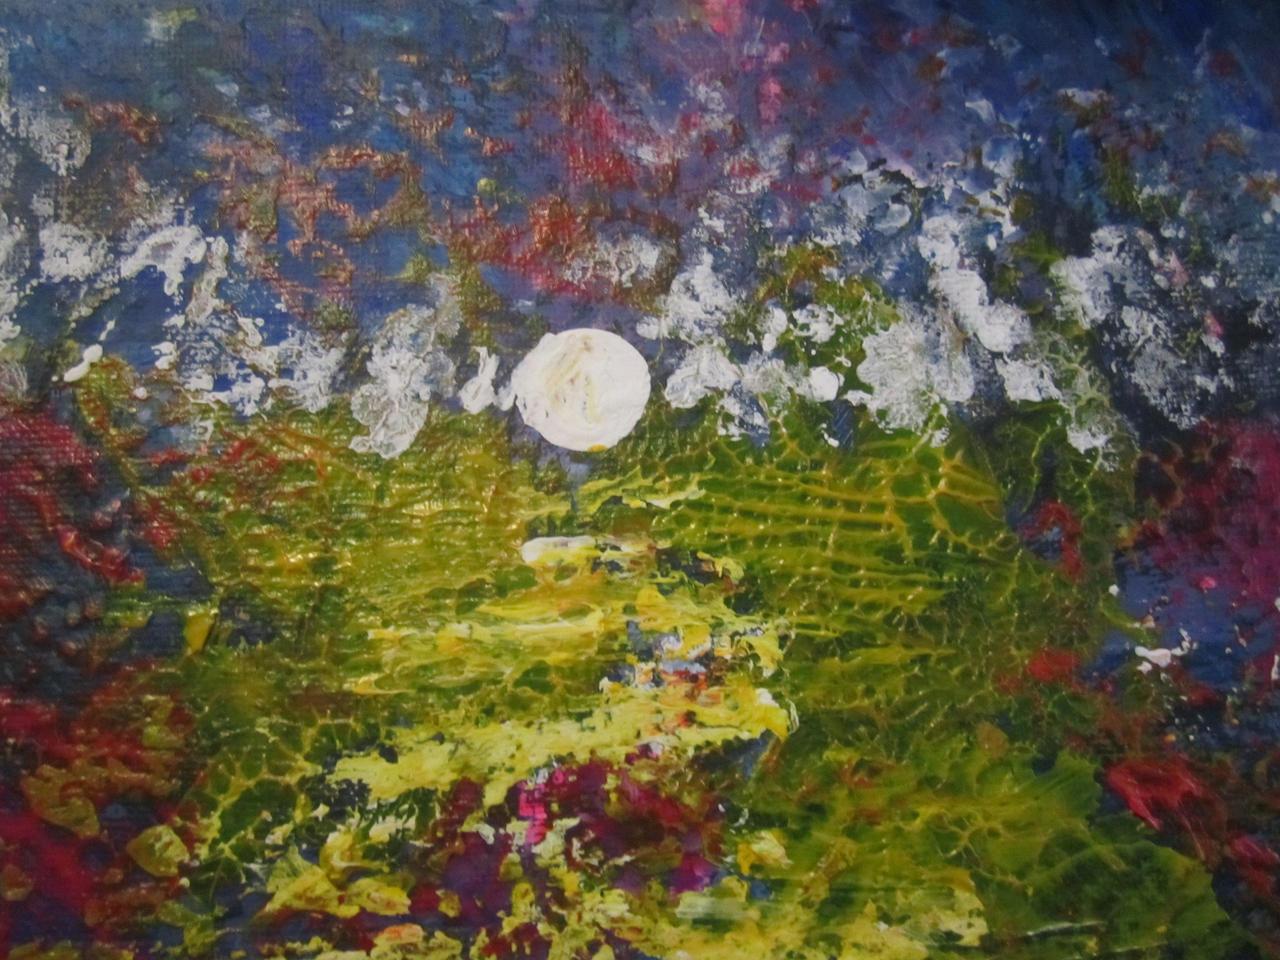 Moonlit Marsh by juliarita